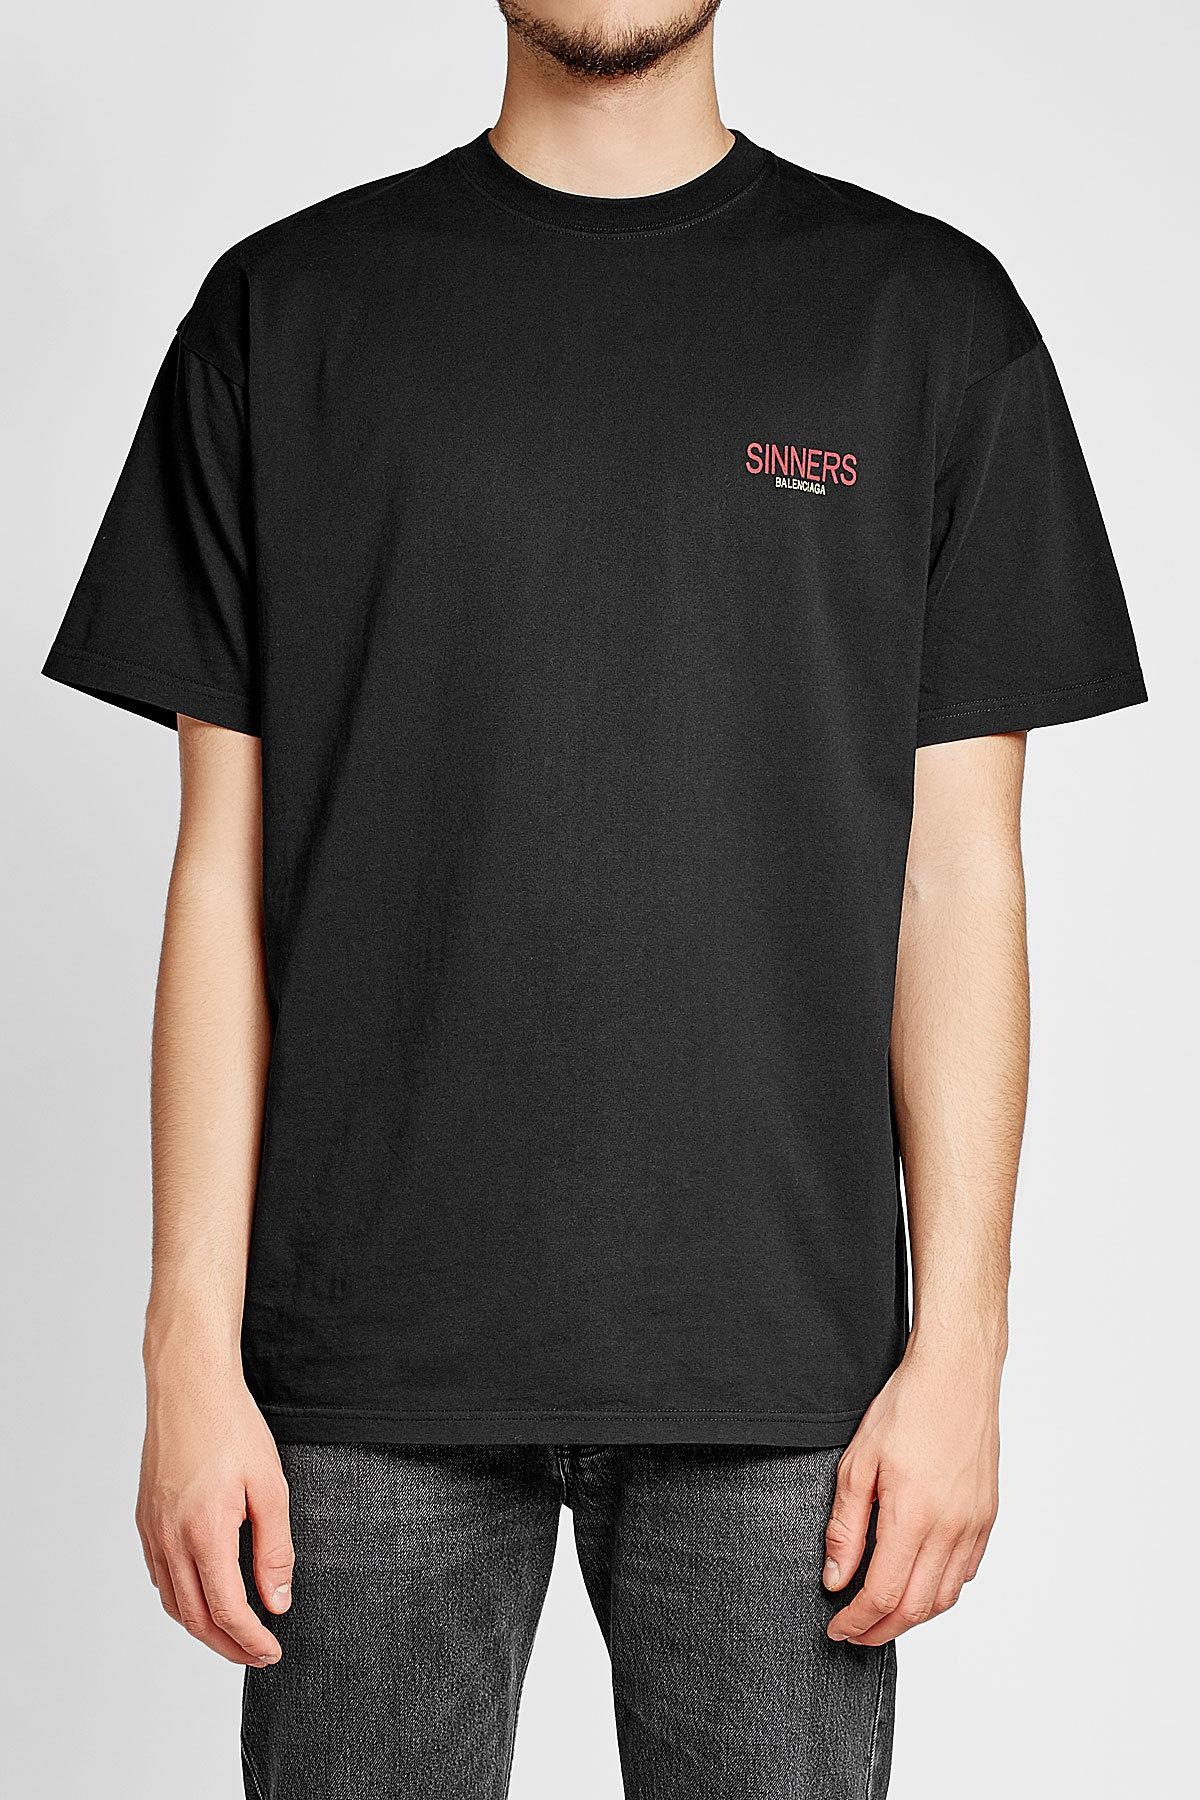 Lyst Balenciaga Sinners Printed Cotton T Shirt In Black